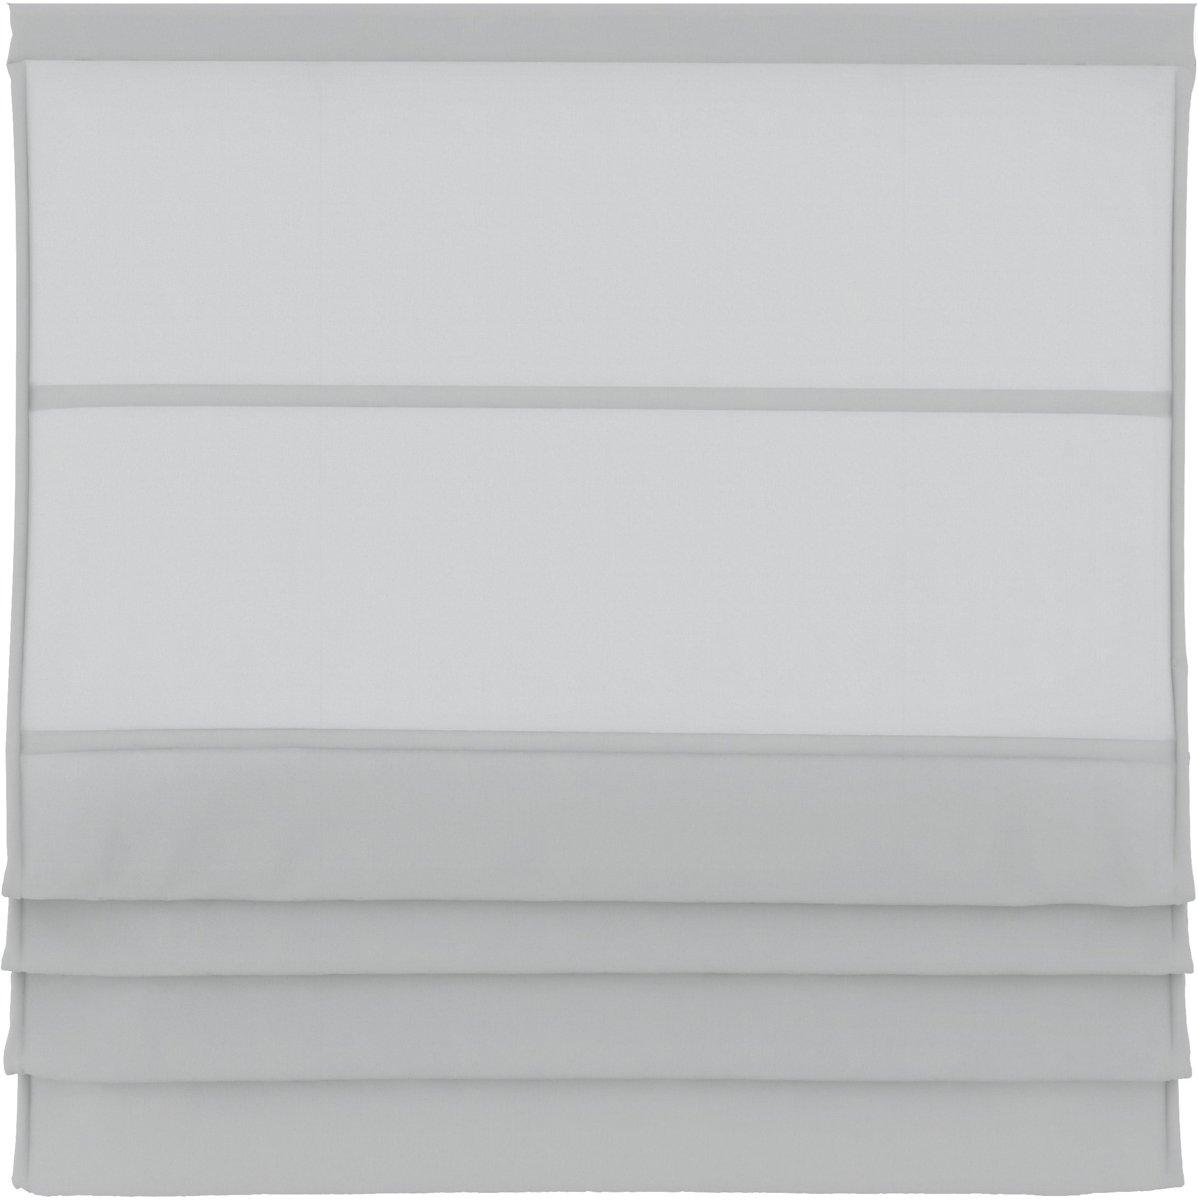 Vouwgordijnen - Wit - Lichtdoorlatend - 100x180 cm kopen